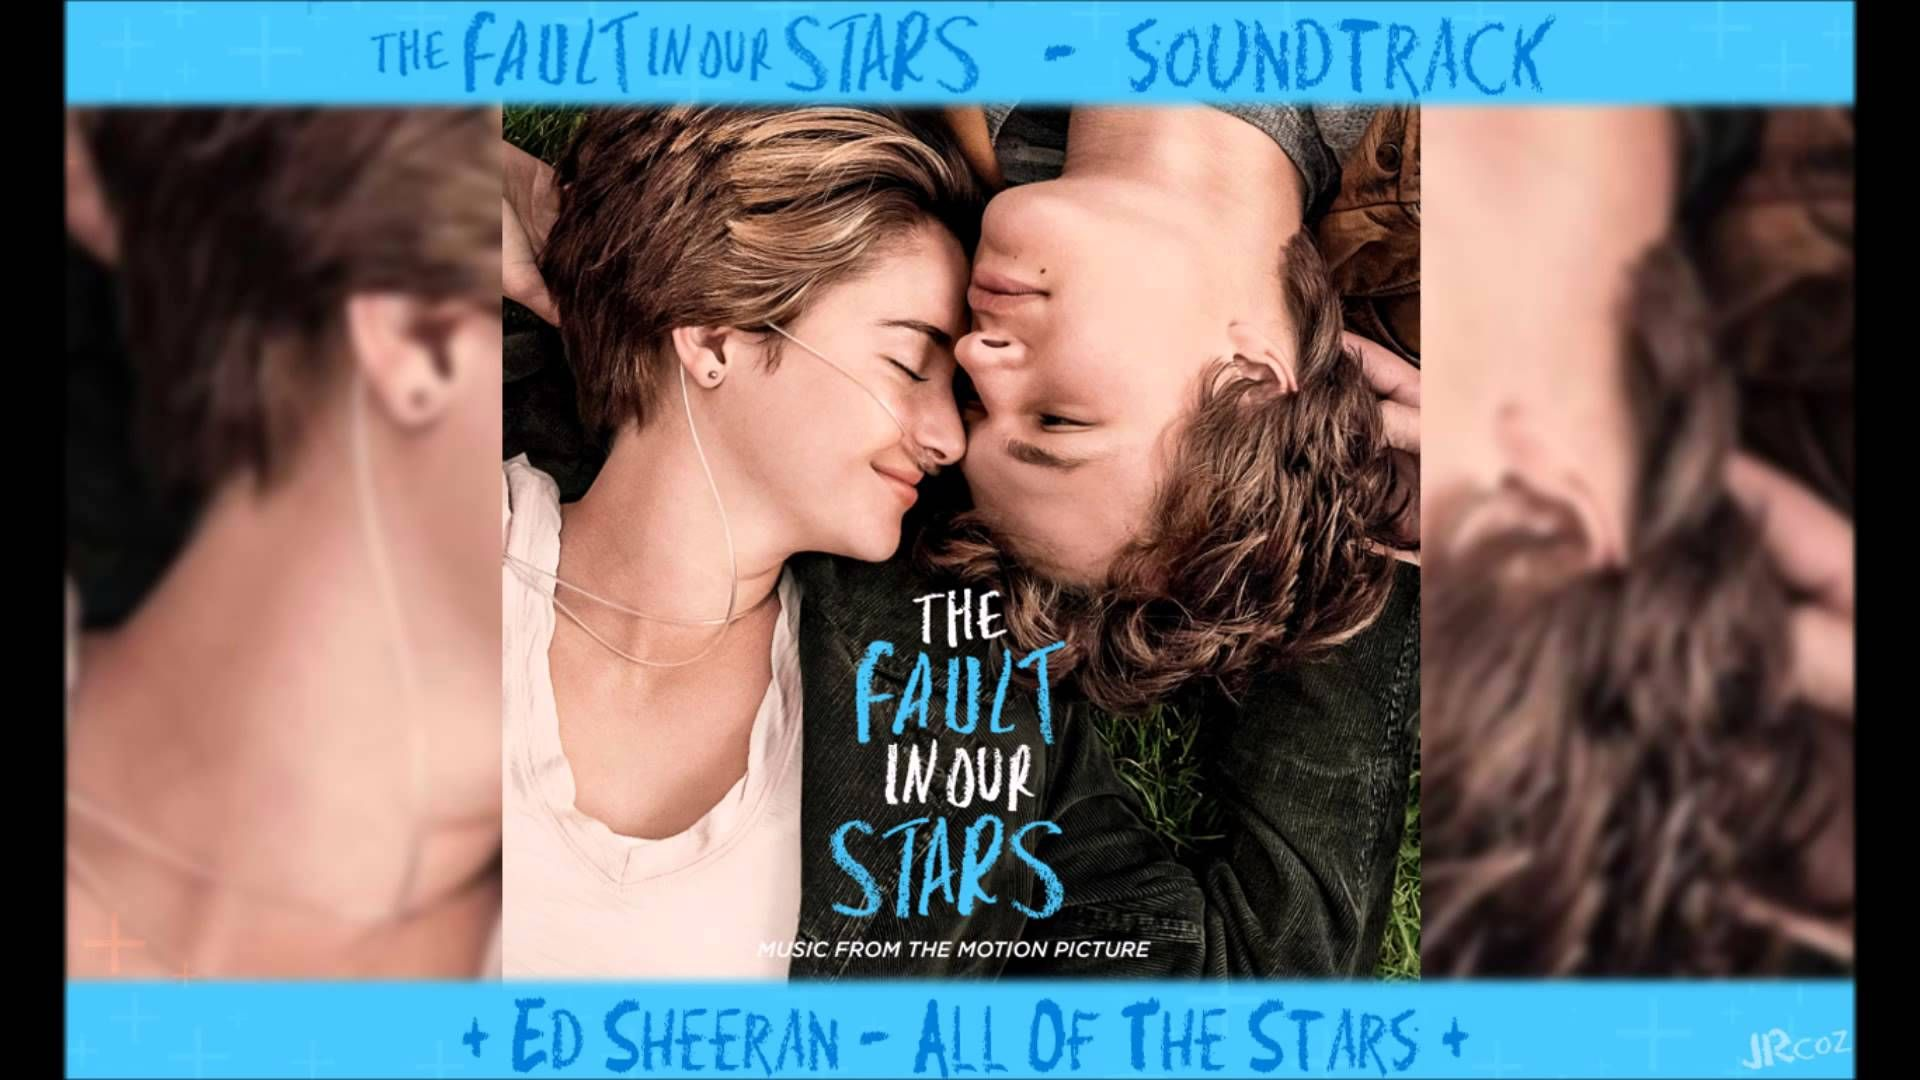 All Of The Stars Sheet Music Ed Sheeran   ♪ SHEETMUSIC